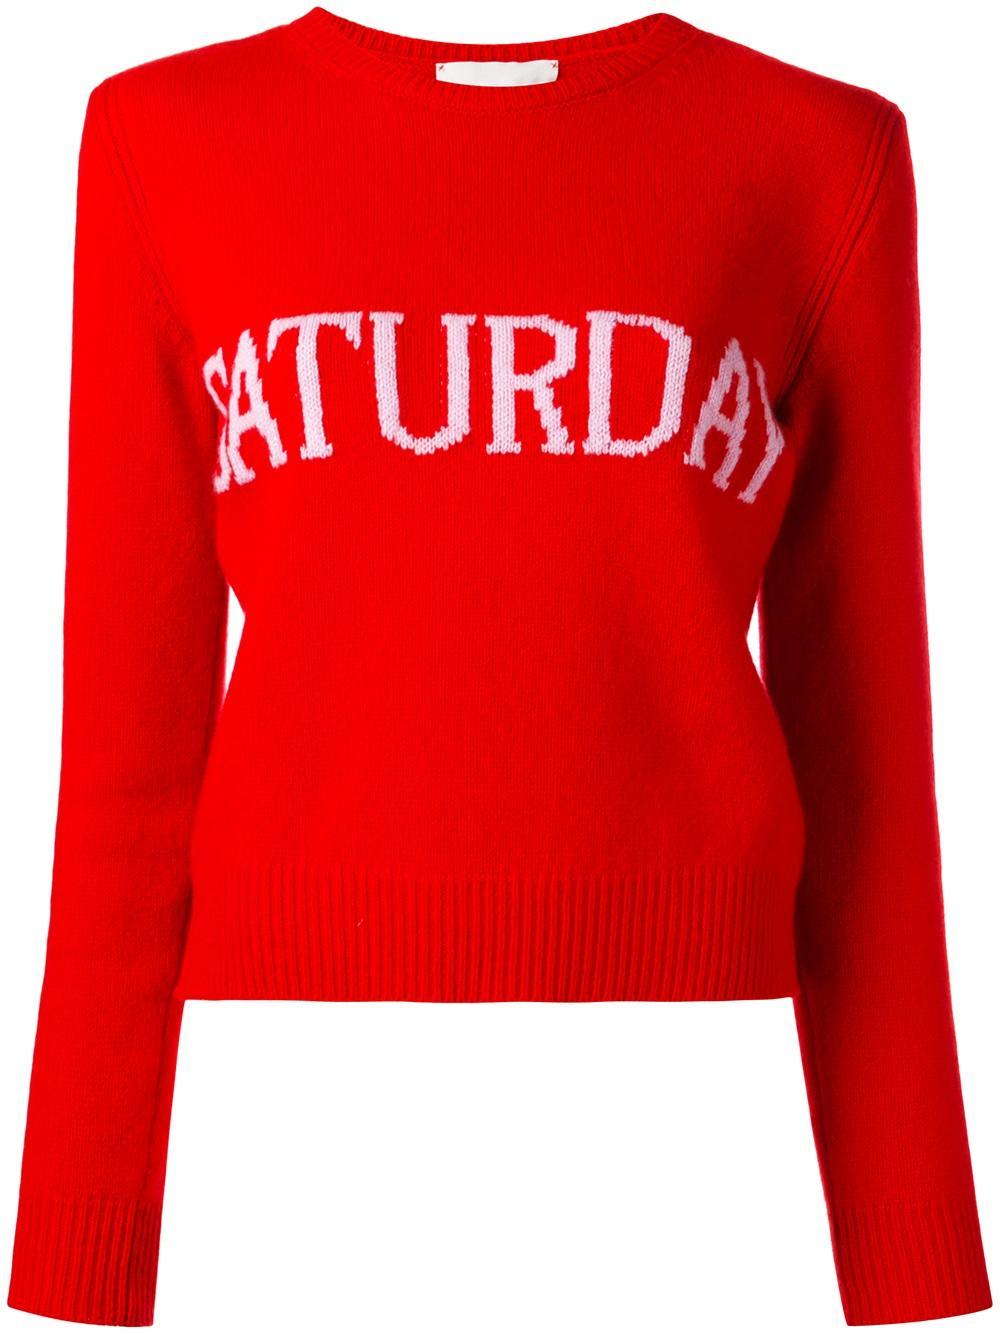 Wool sweater,Alberta Ferretti atEspace Cannelle